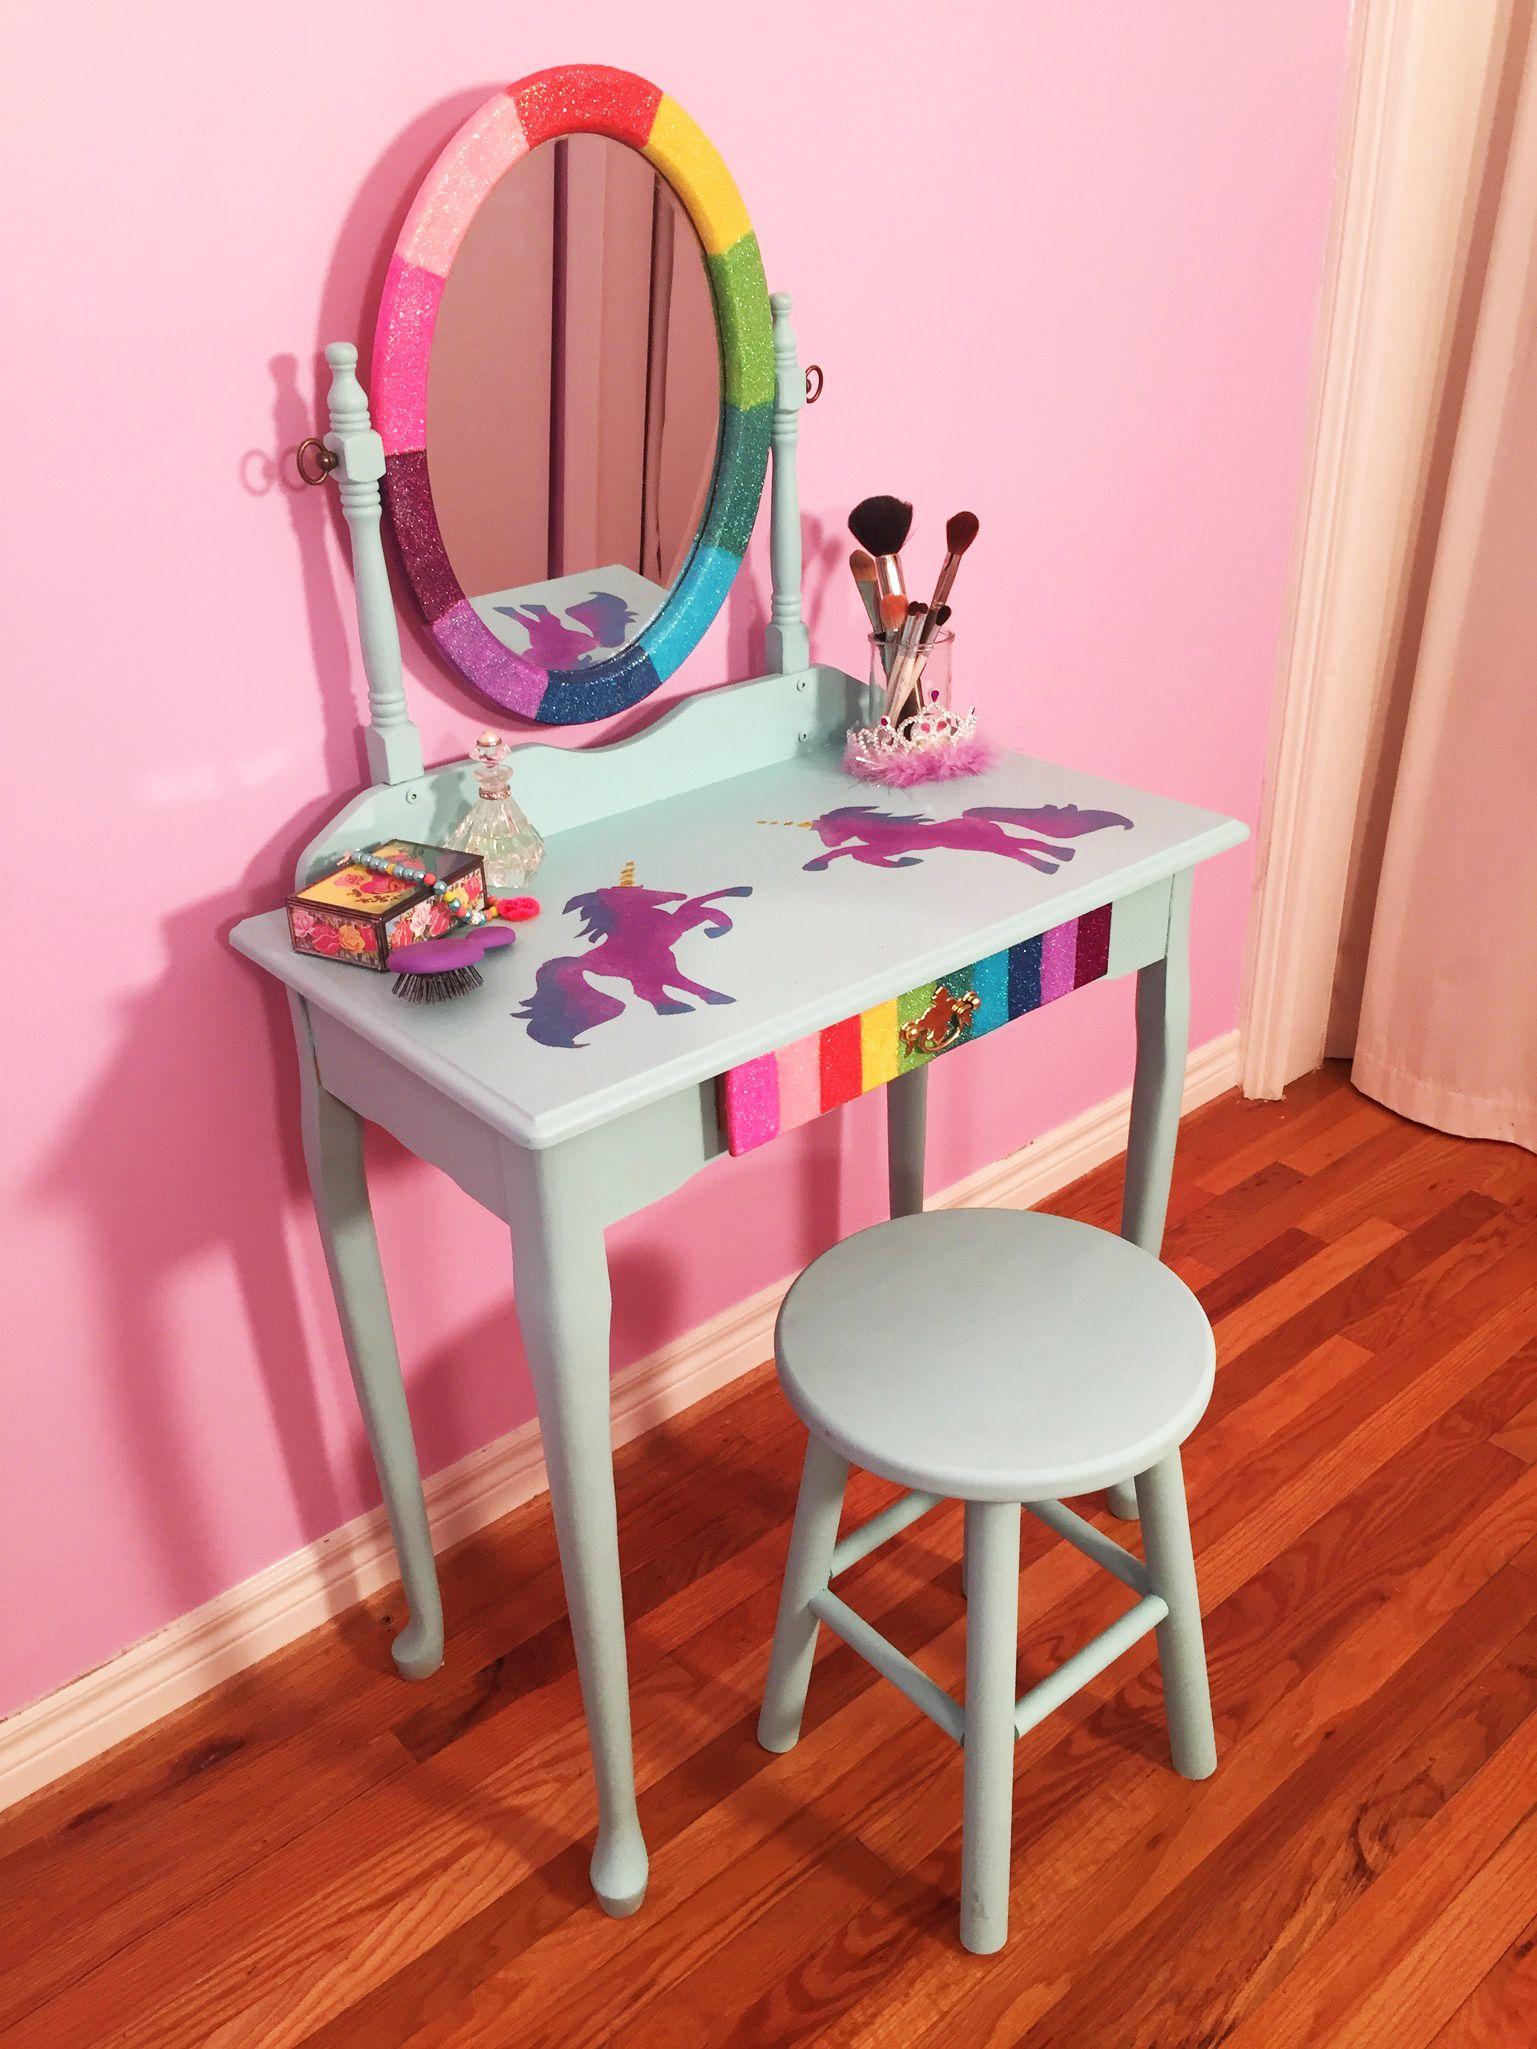 Diy glitter rainbow and galatic unicorn makeup vanity furniture diy glitter rainbow and galatic unicorn makeup vanity furniture flip with an old 80s vanity geotapseo Images